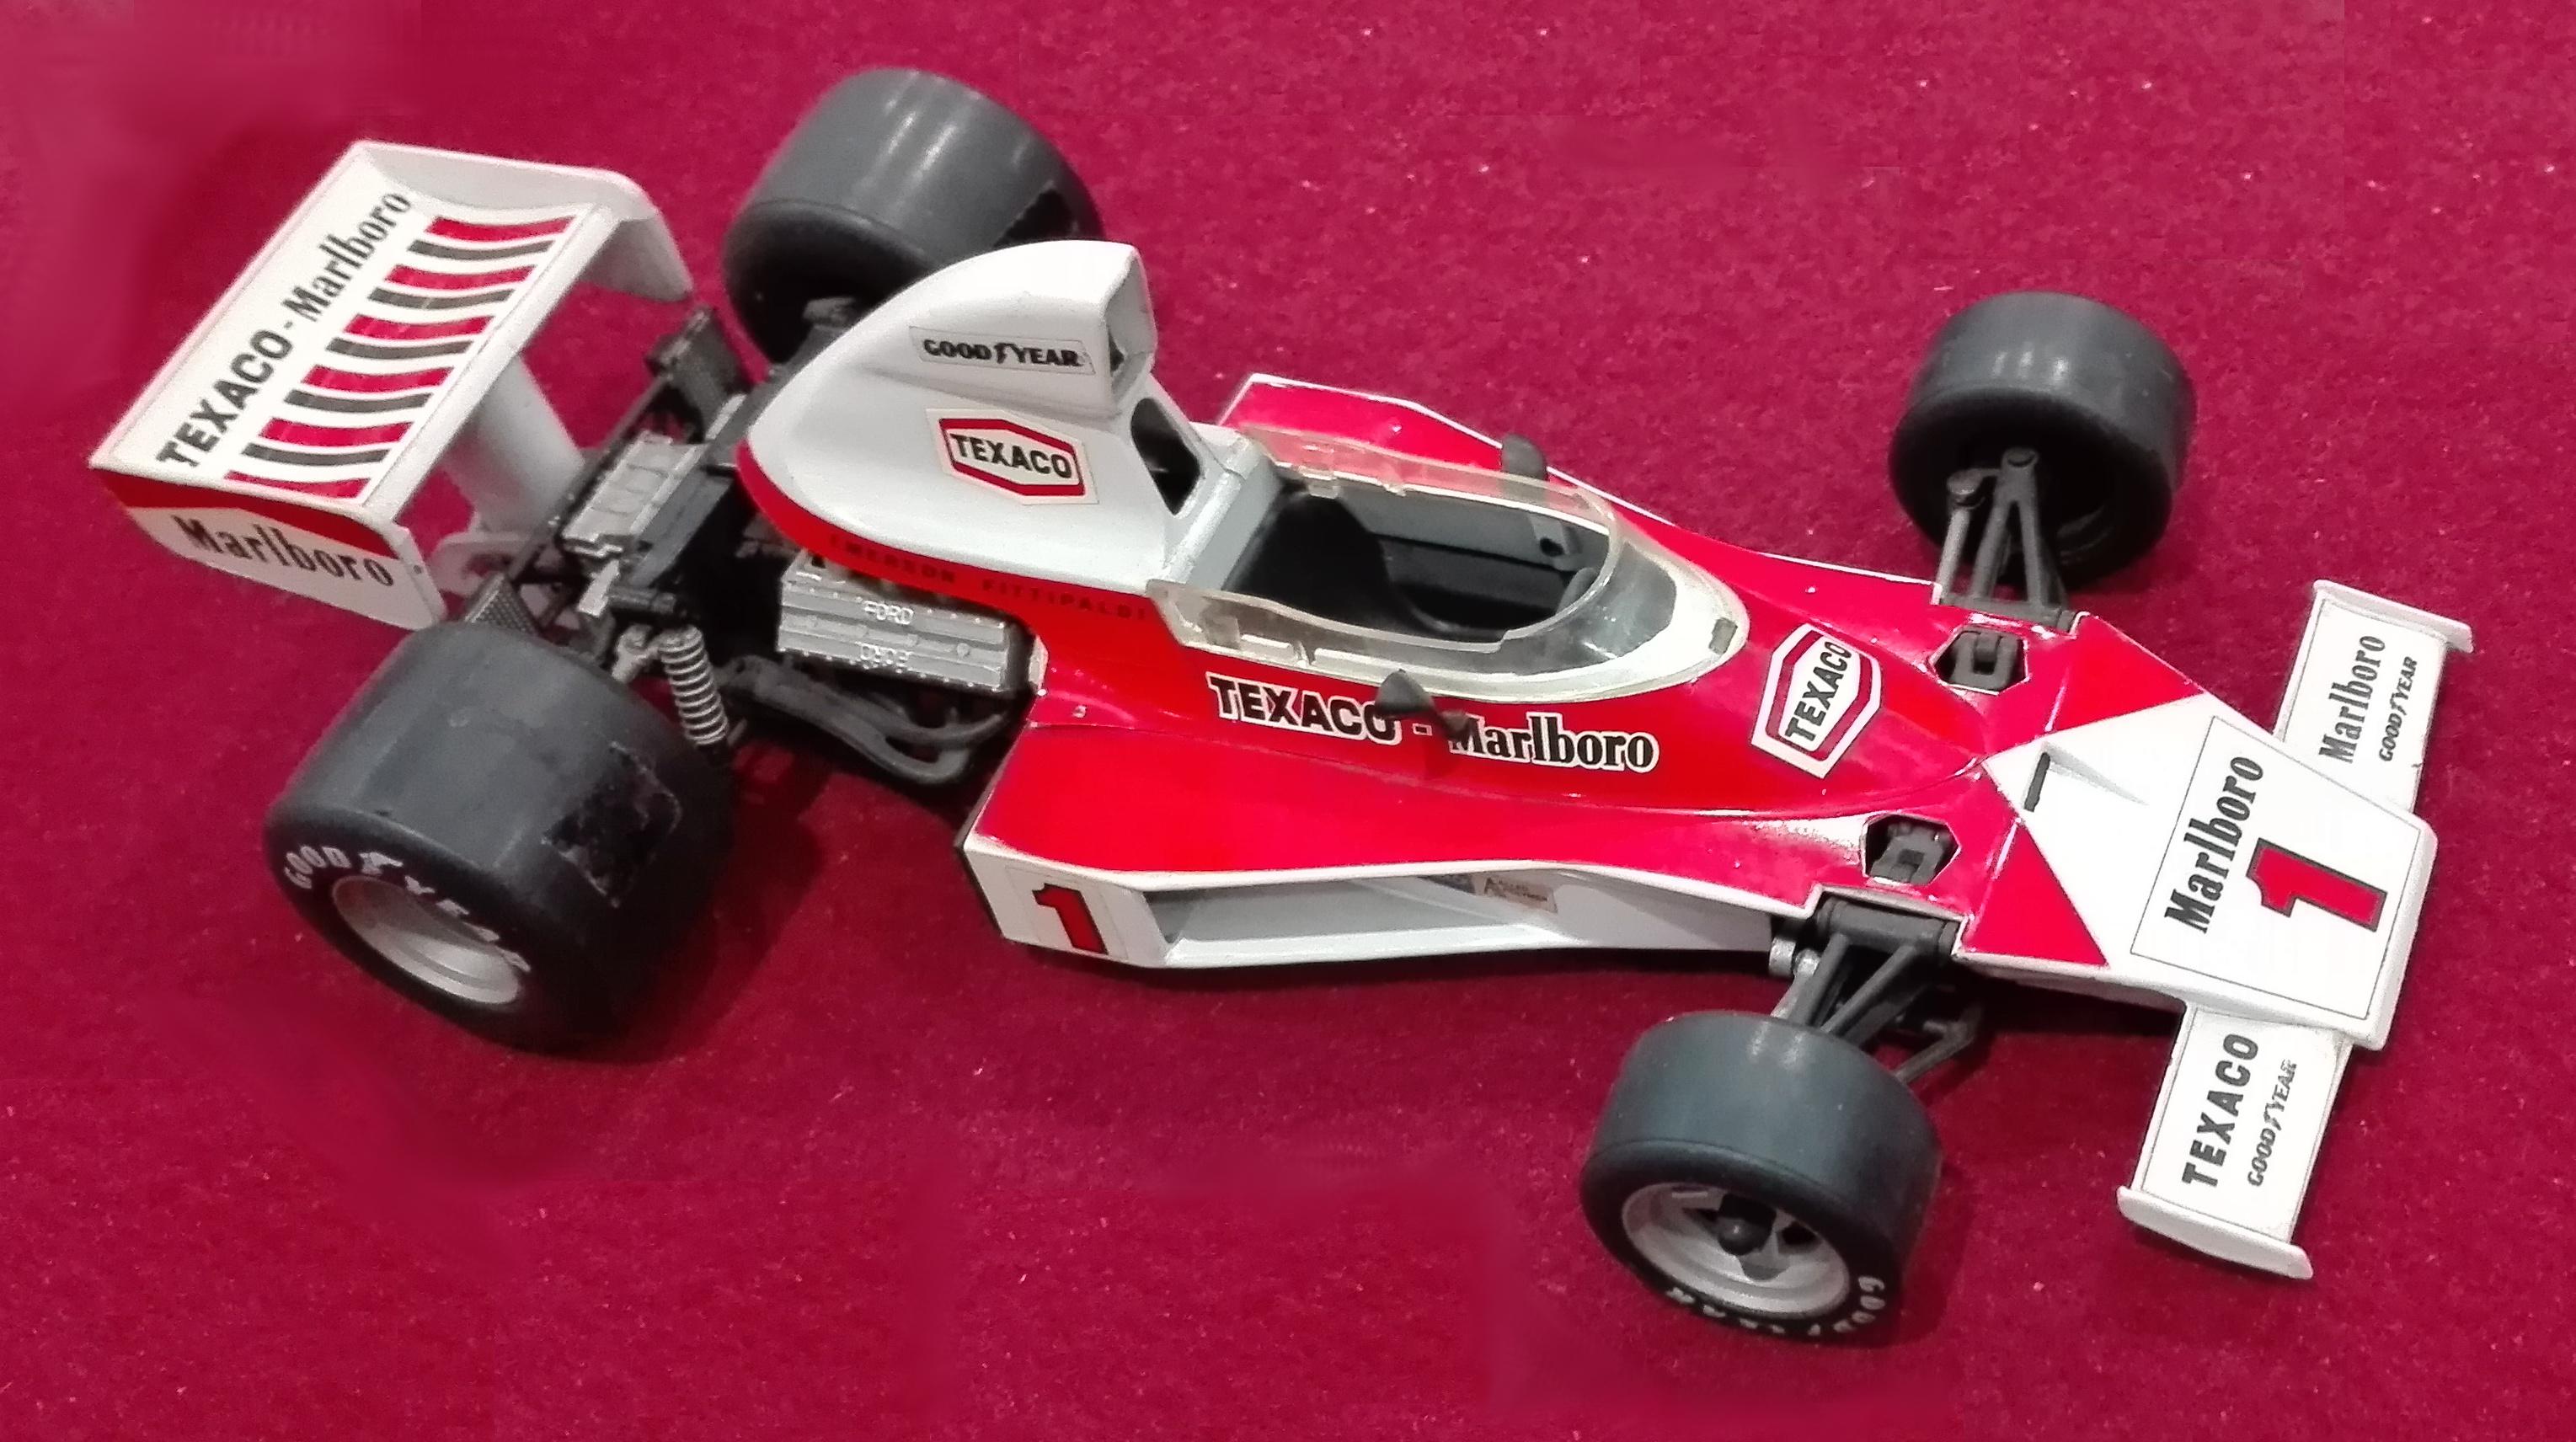 GF2, McLaren F1 M 23 Num.1 Marlboro Fittipaldi (cc-by-sa my photo)